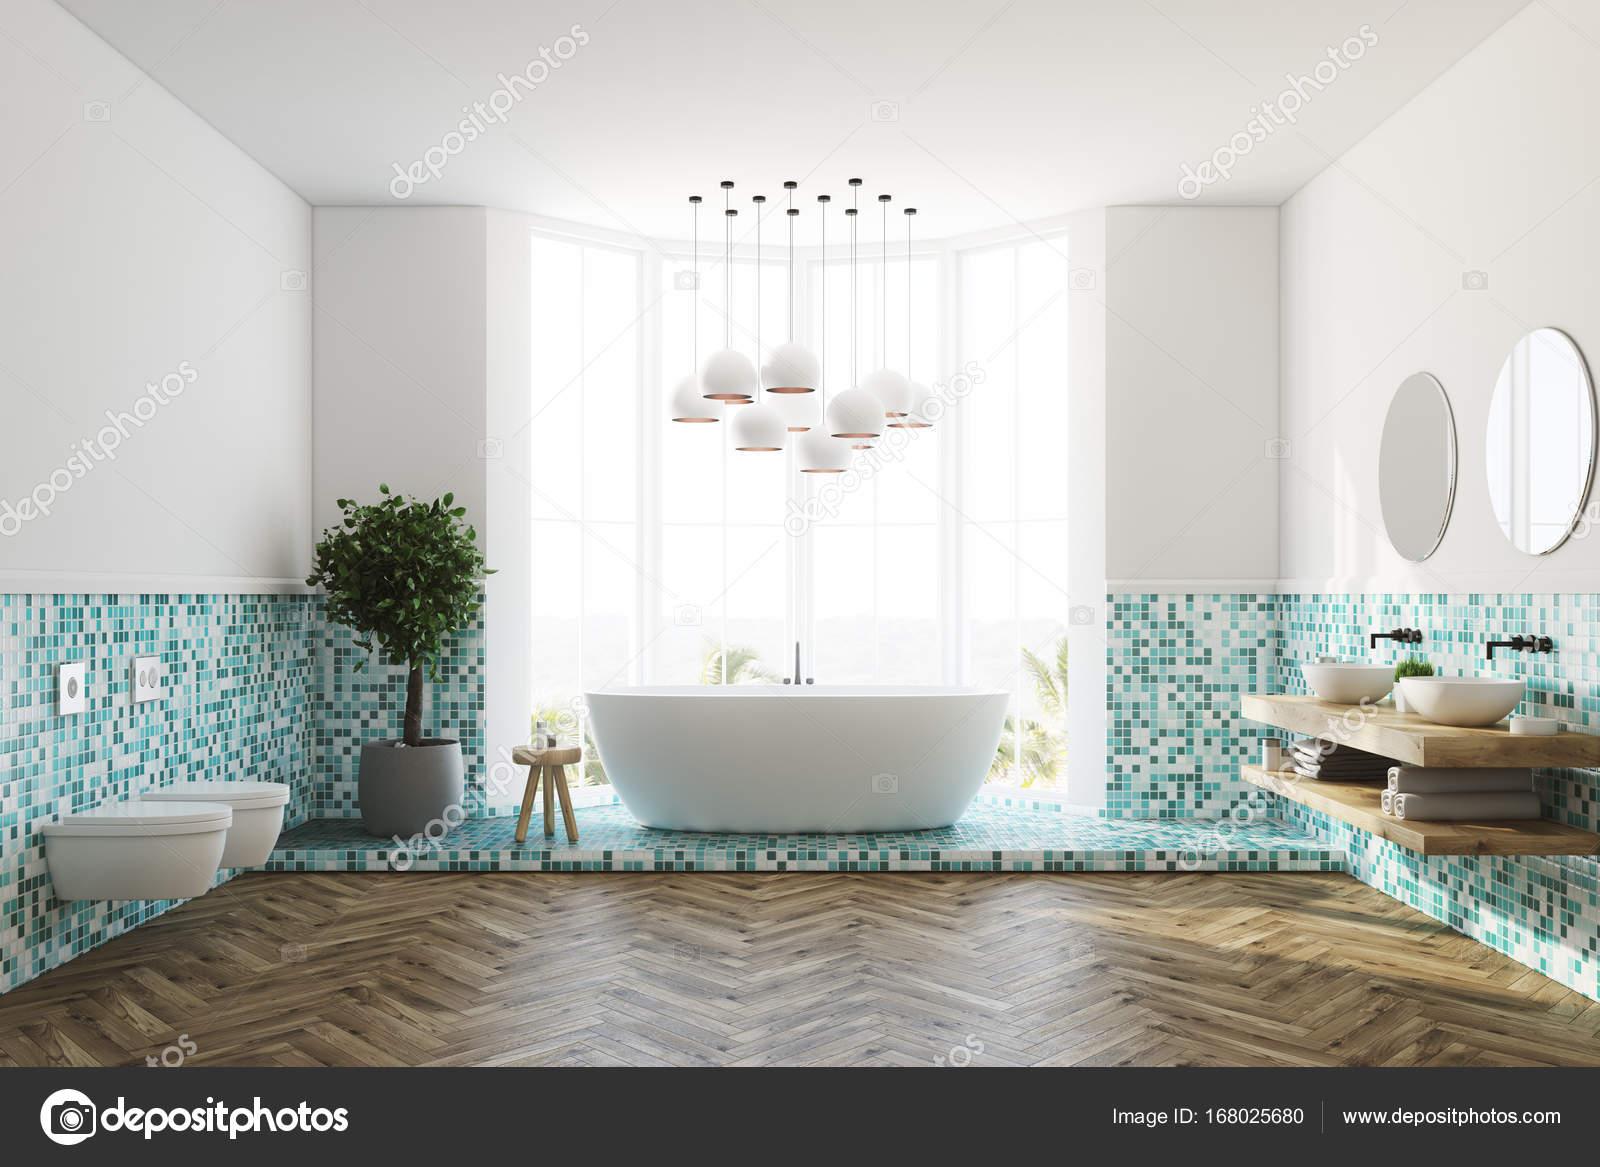 https://st3.depositphotos.com/2673929/16802/i/1600/depositphotos_168025680-stockafbeelding-groene-badkamer-interieur-bad-en.jpg